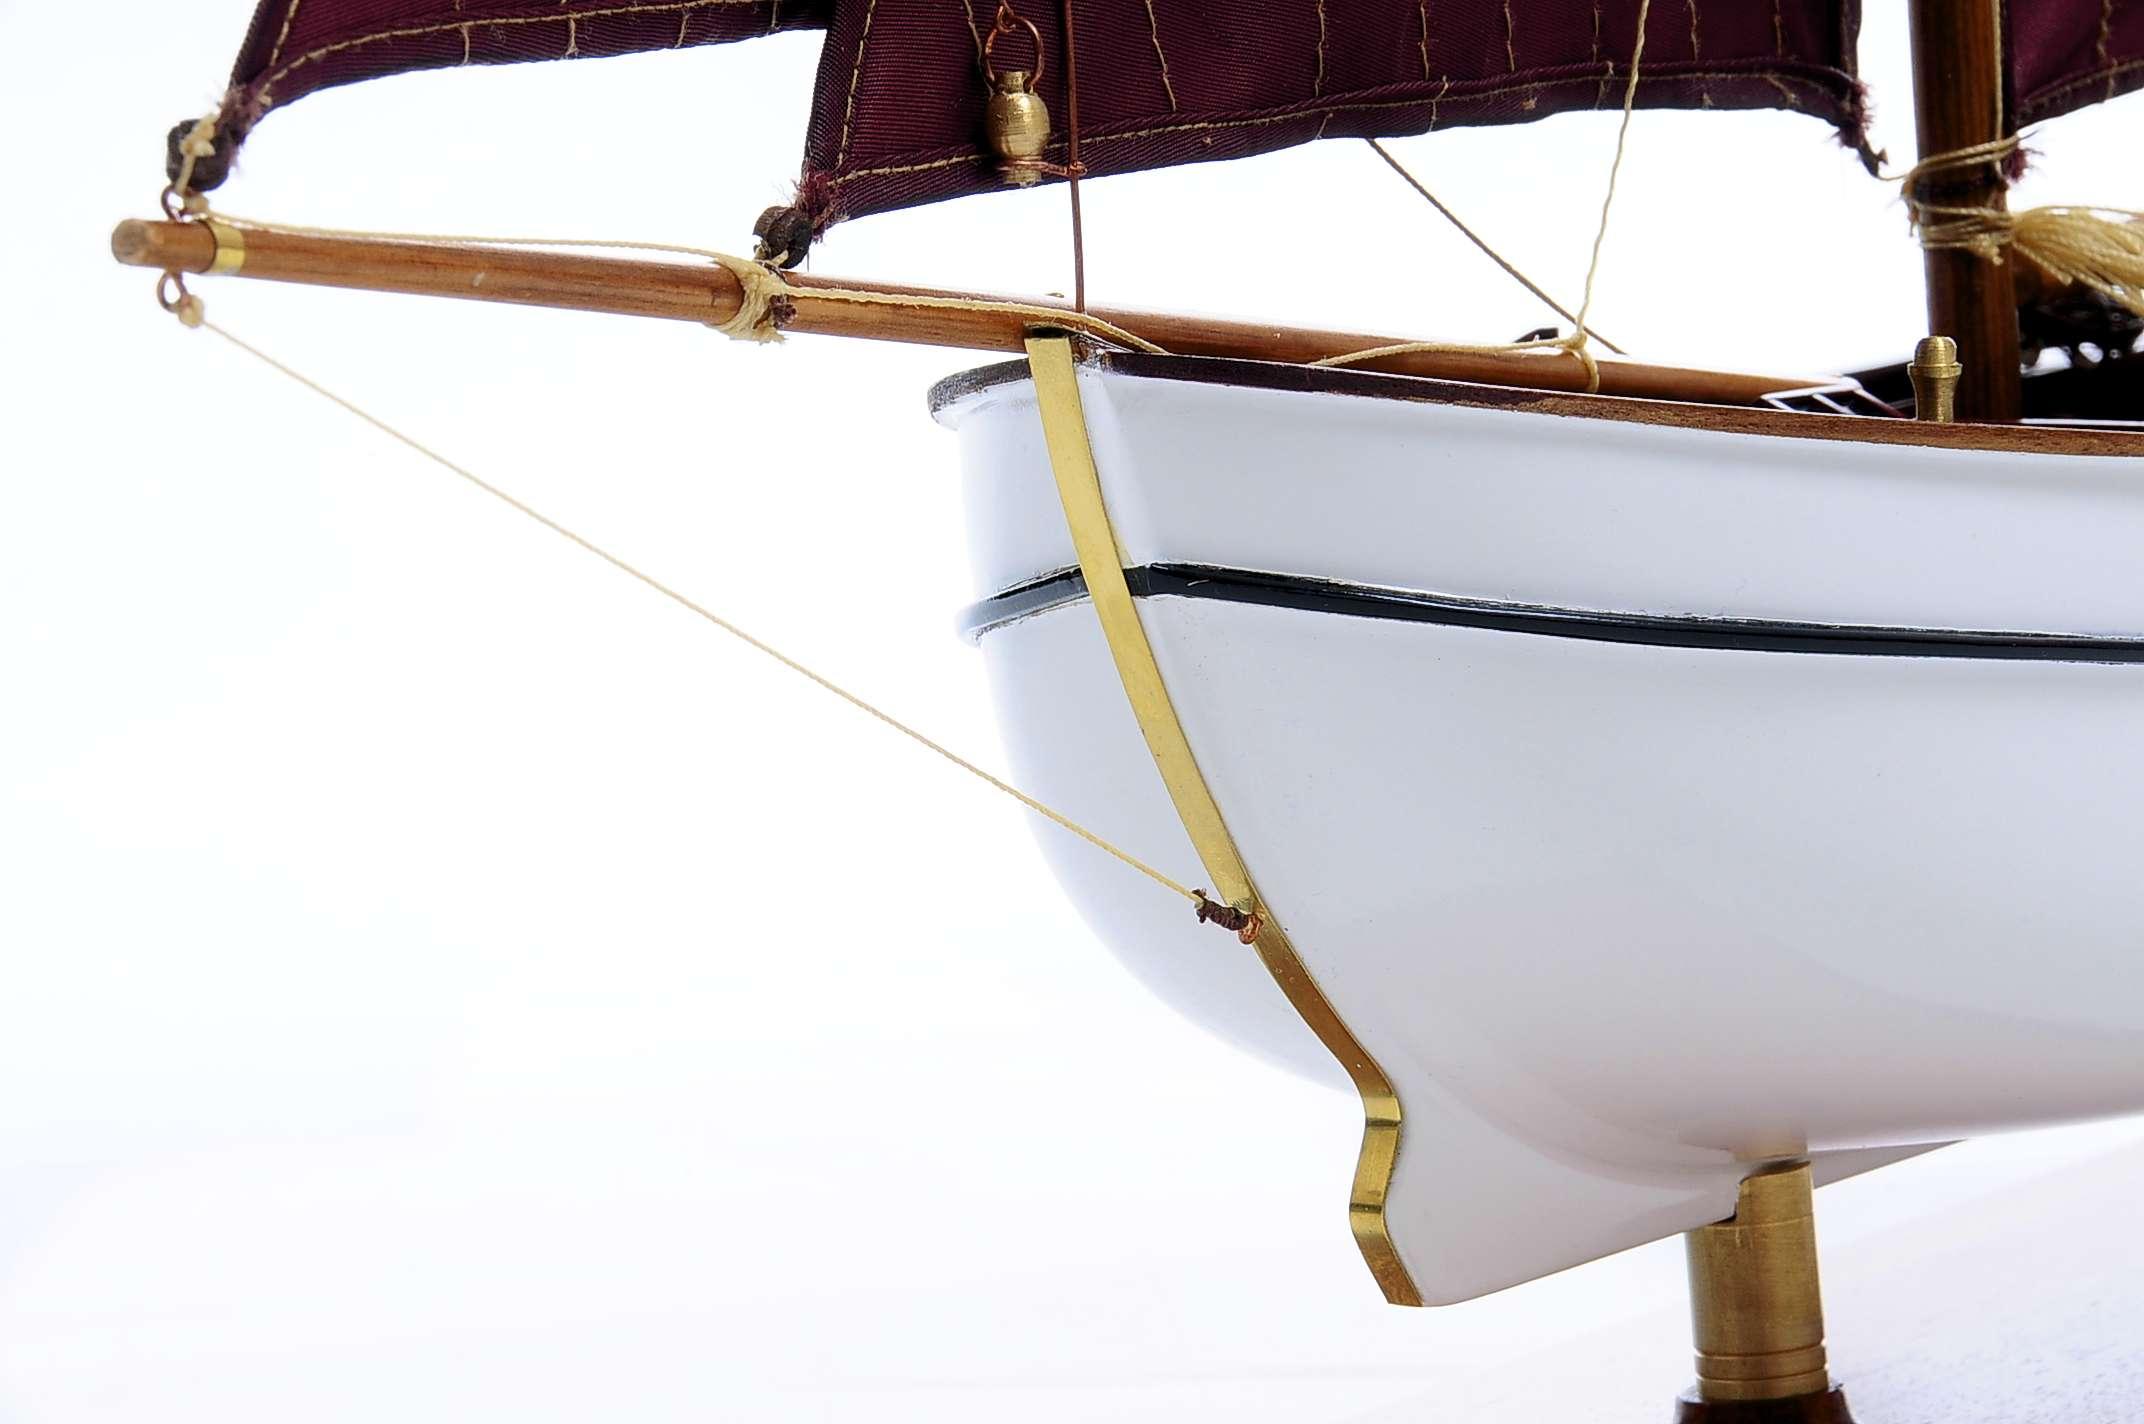 1432-4574-Dutch-Marker-Roundbow-Model-Boat